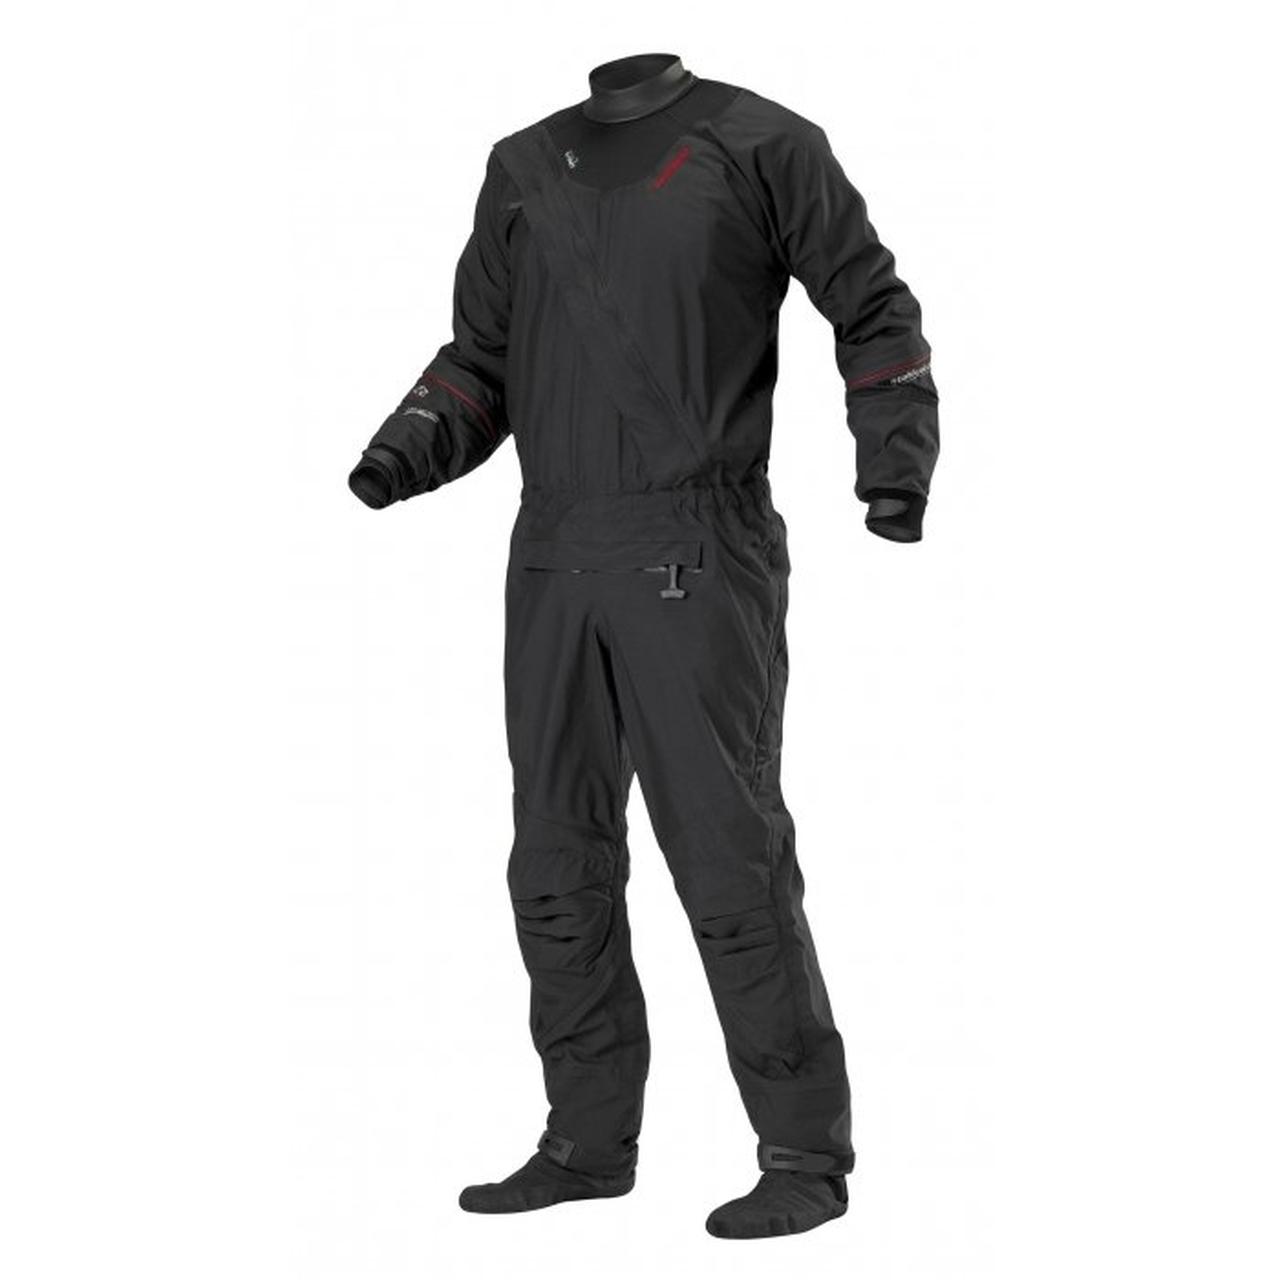 stohlquist-ez-drysuit-front-30606.1533270254.jpg